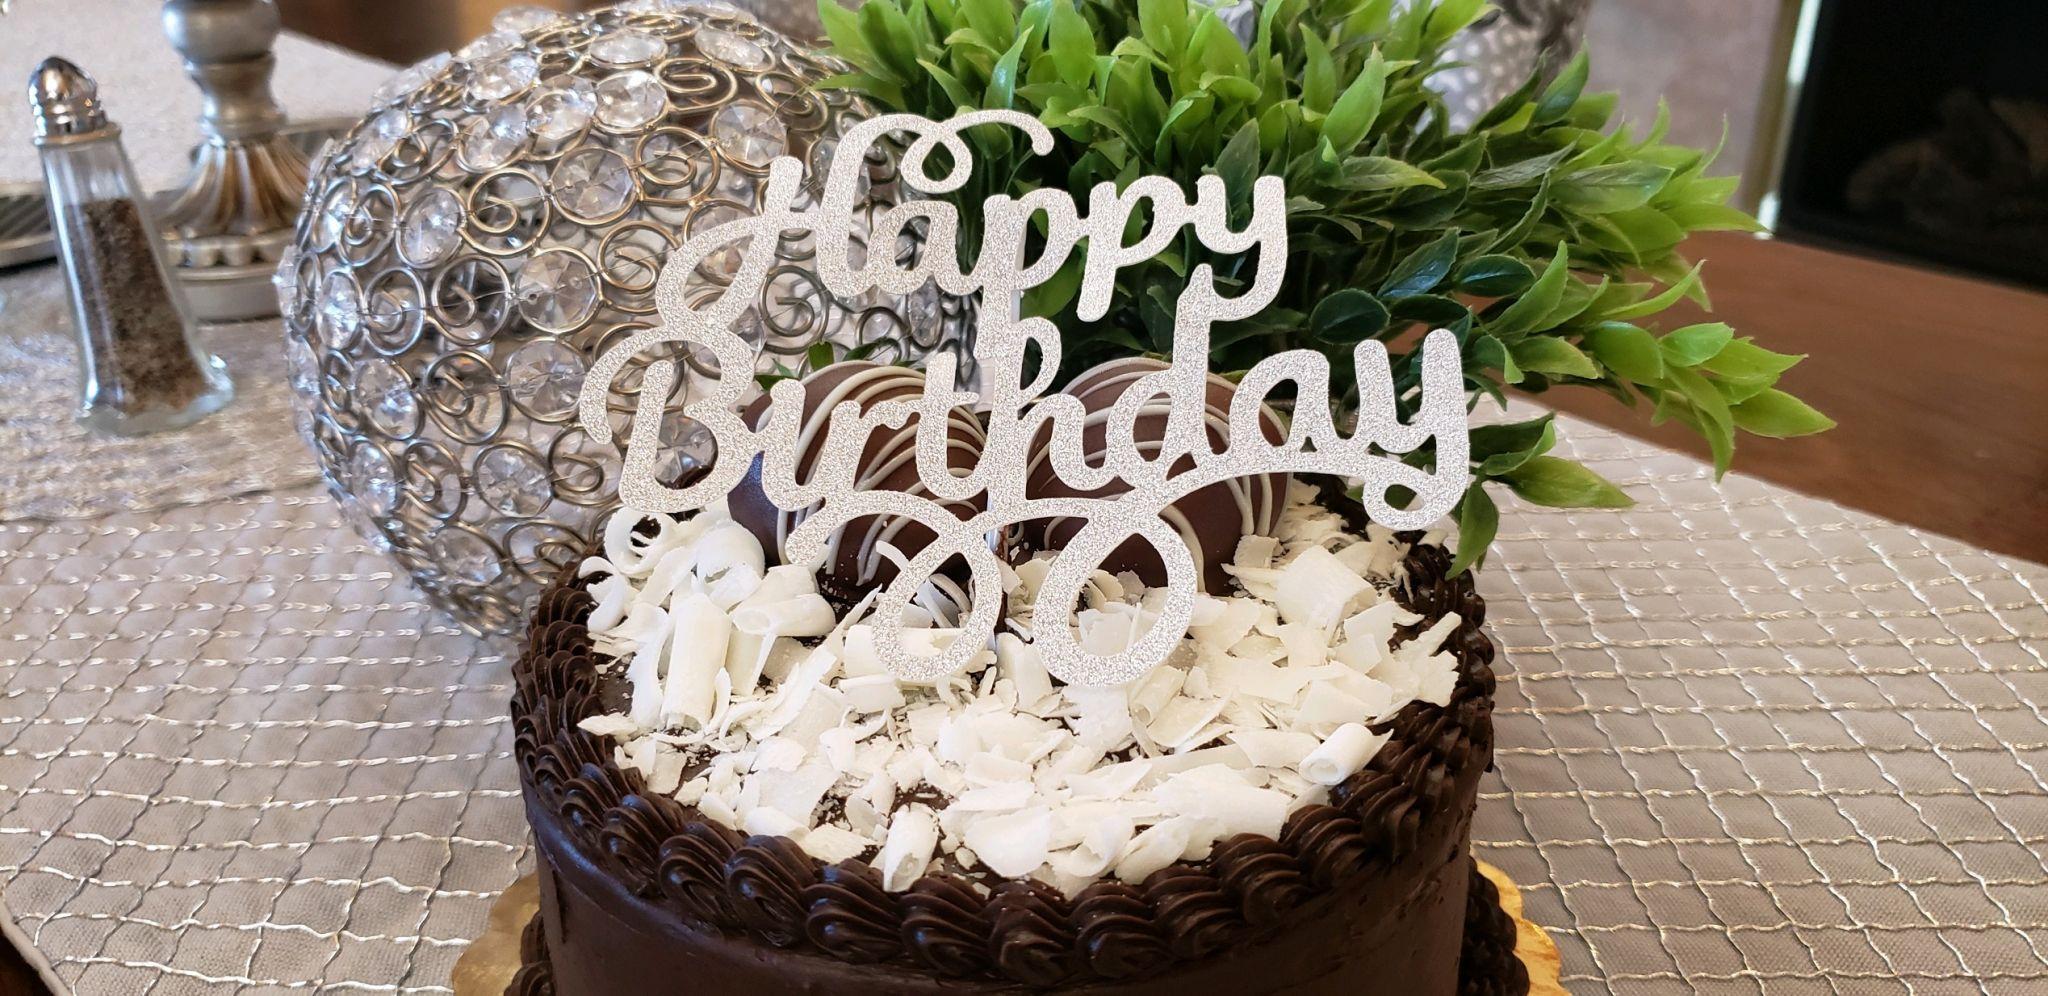 Birthday-Cake-at-Donnas-Premier-Lodging.jpg?mtime=20190328100159#asset:1263